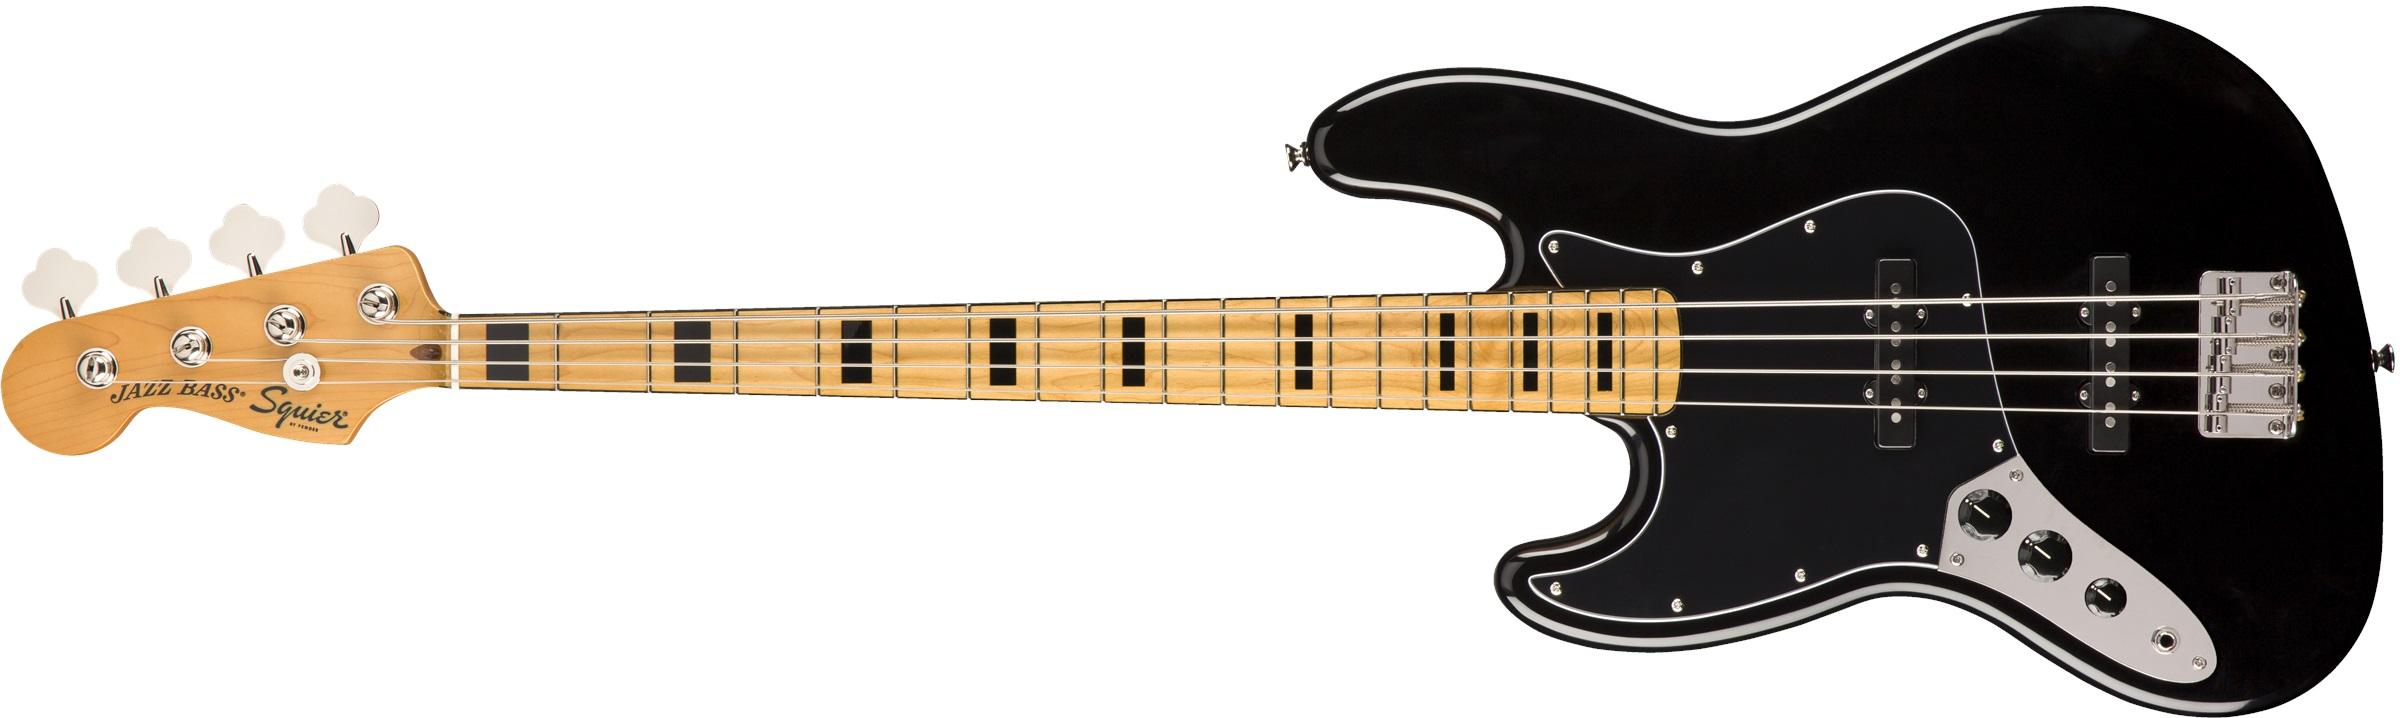 Fender Squier Classic Vibe '70s Jazz Bass® LH MFB BK